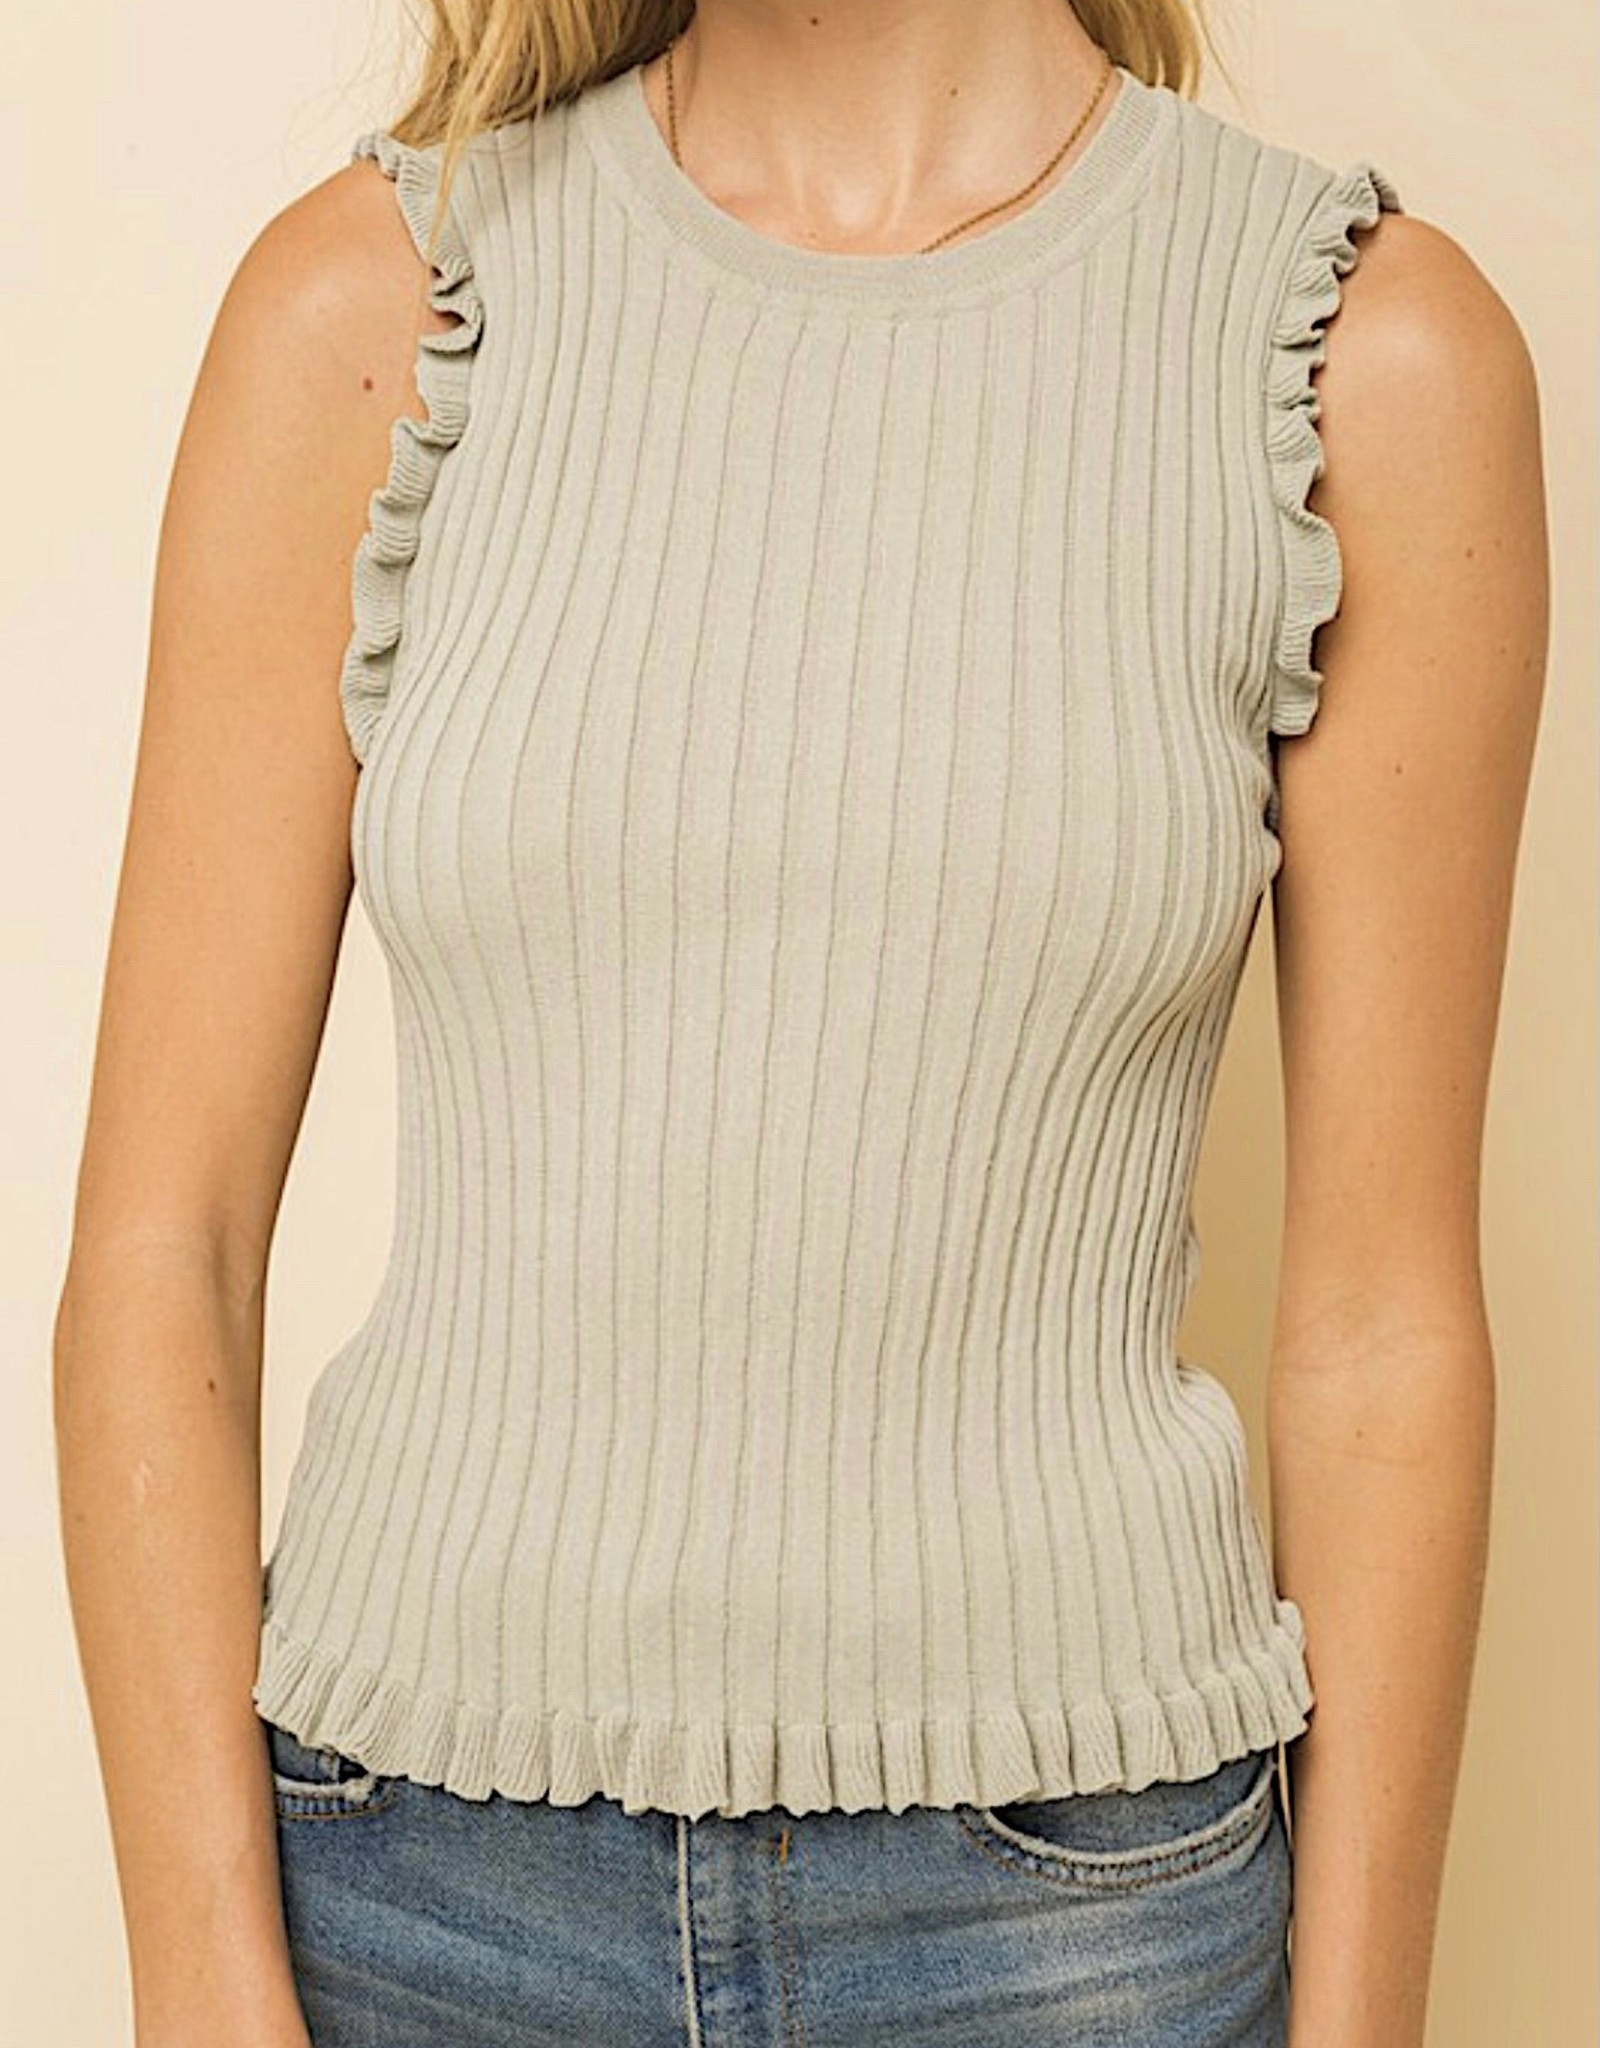 HUSH Sleeveless frill trim knit tank